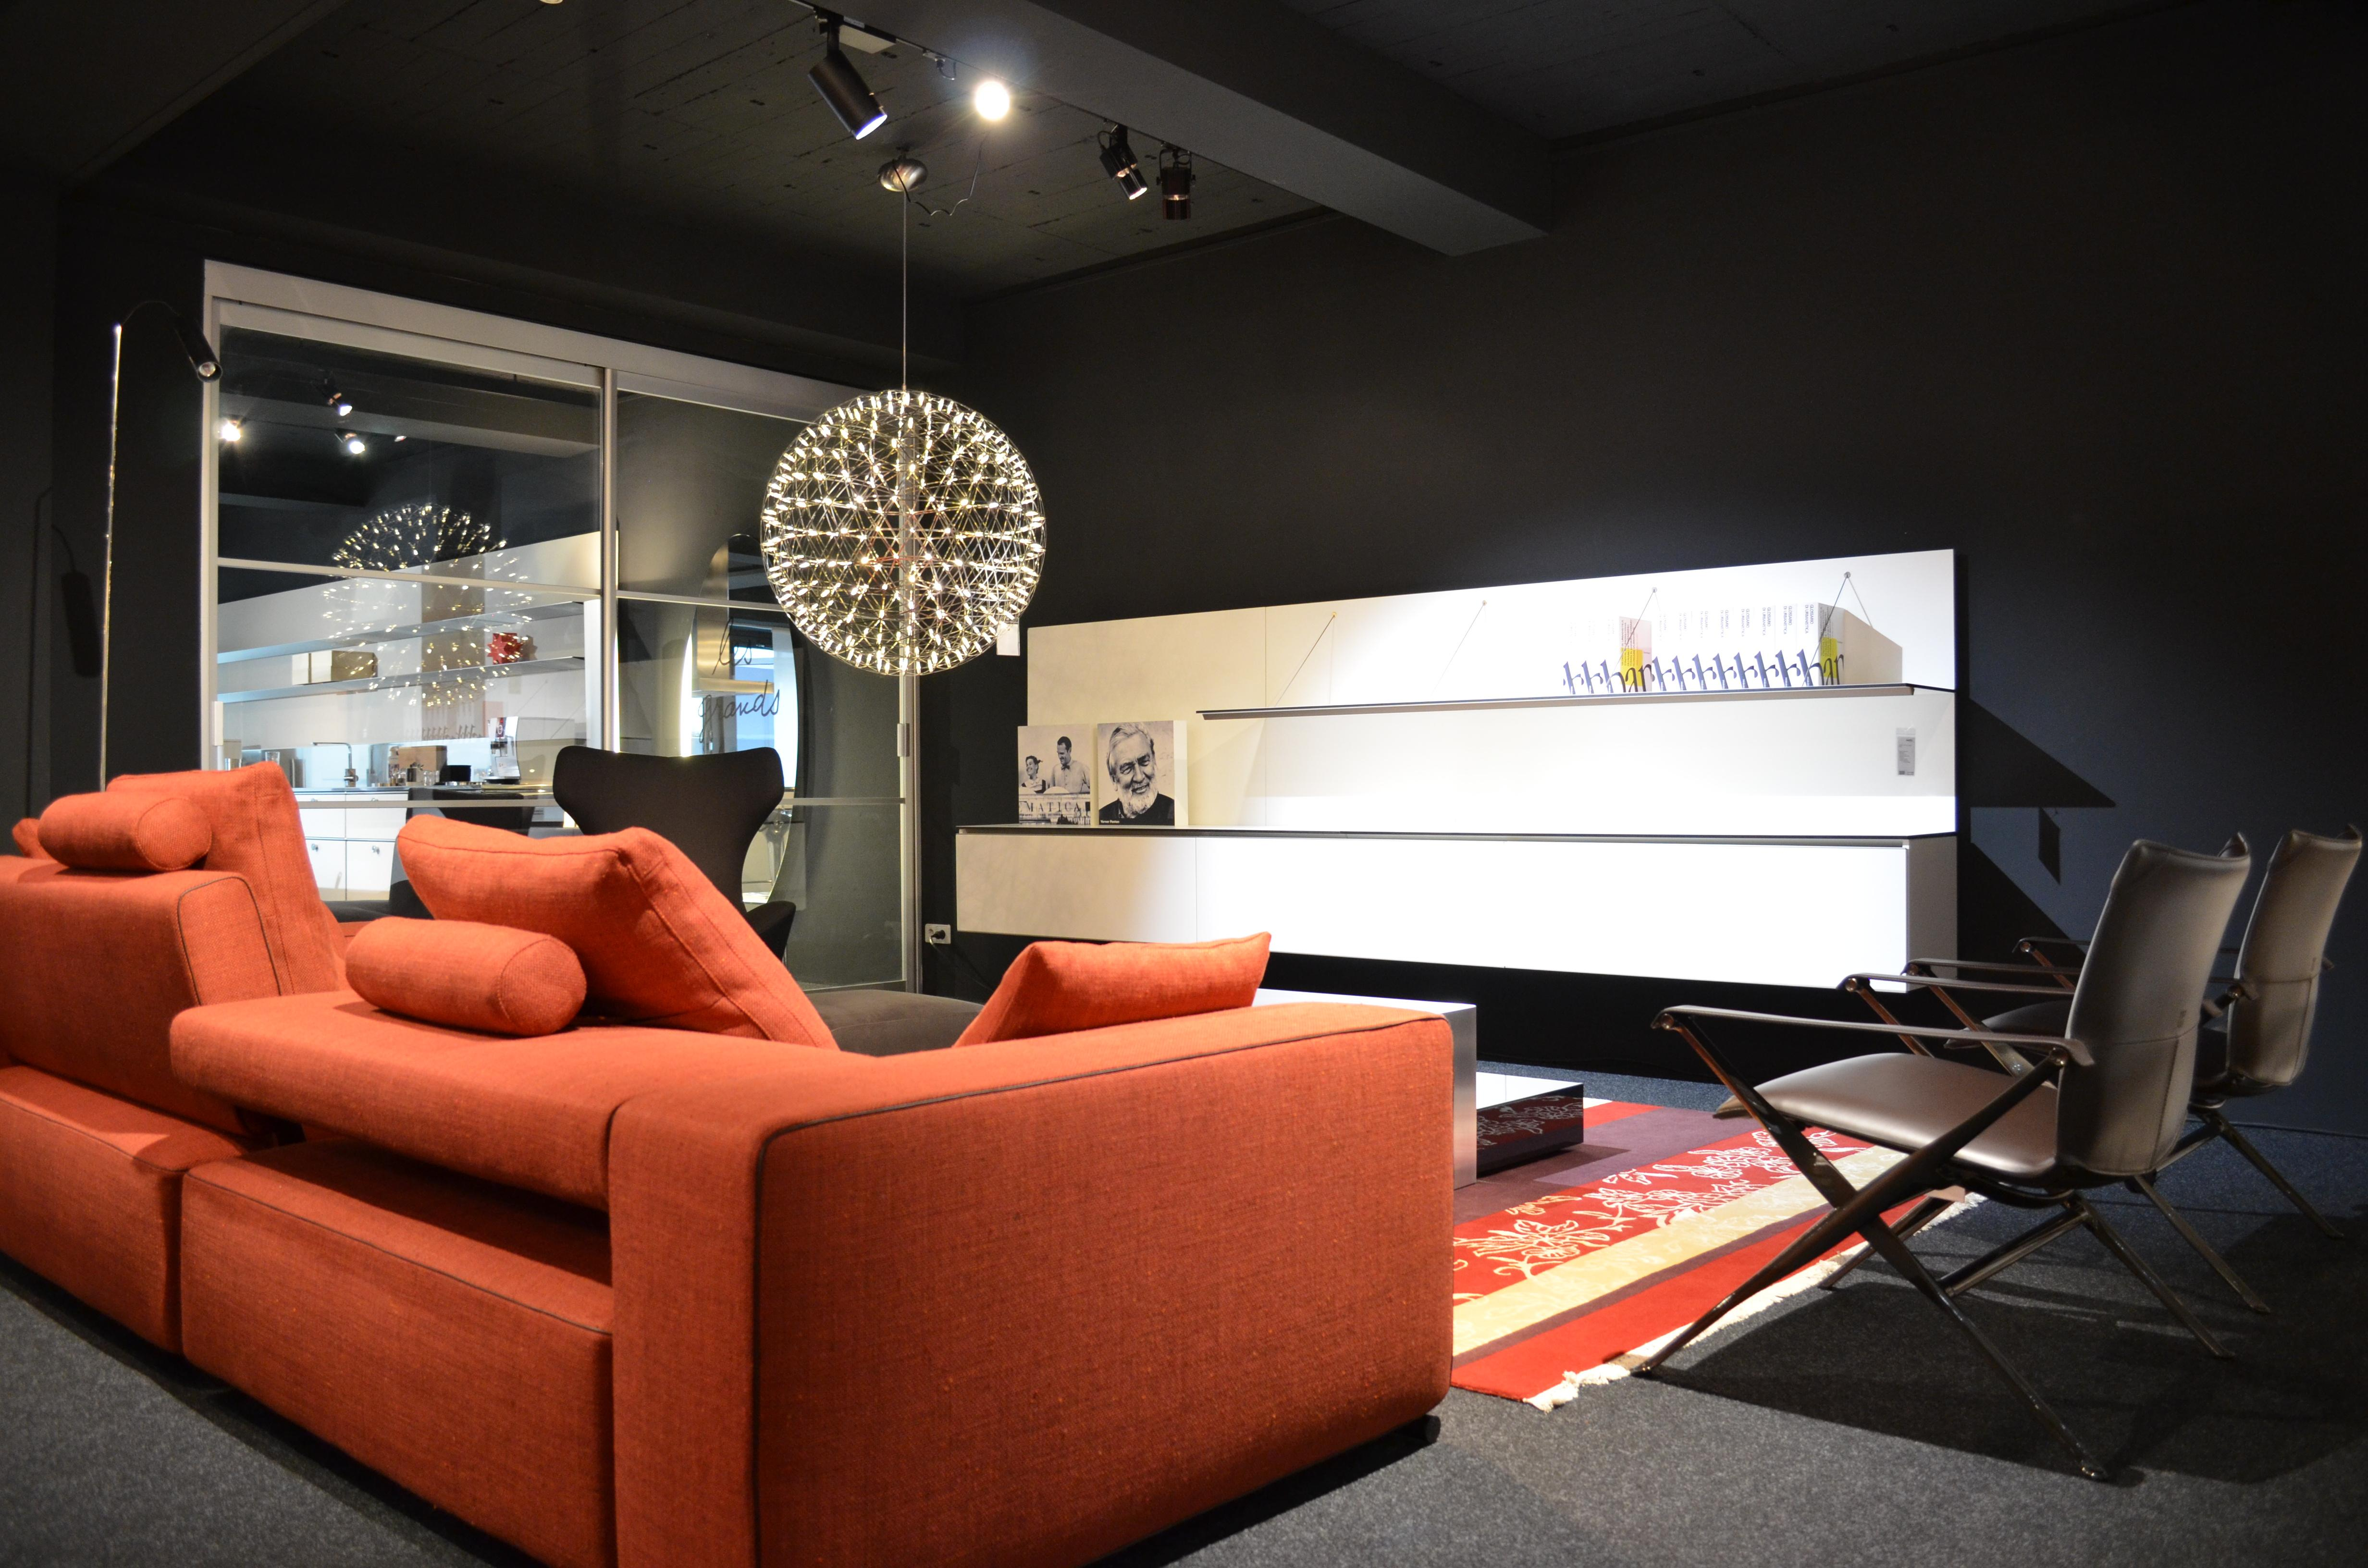 Szene Aus Unserem Showroom. PAP Schranksystem. Sofa Andy. #wandgestaltung  #sofa #